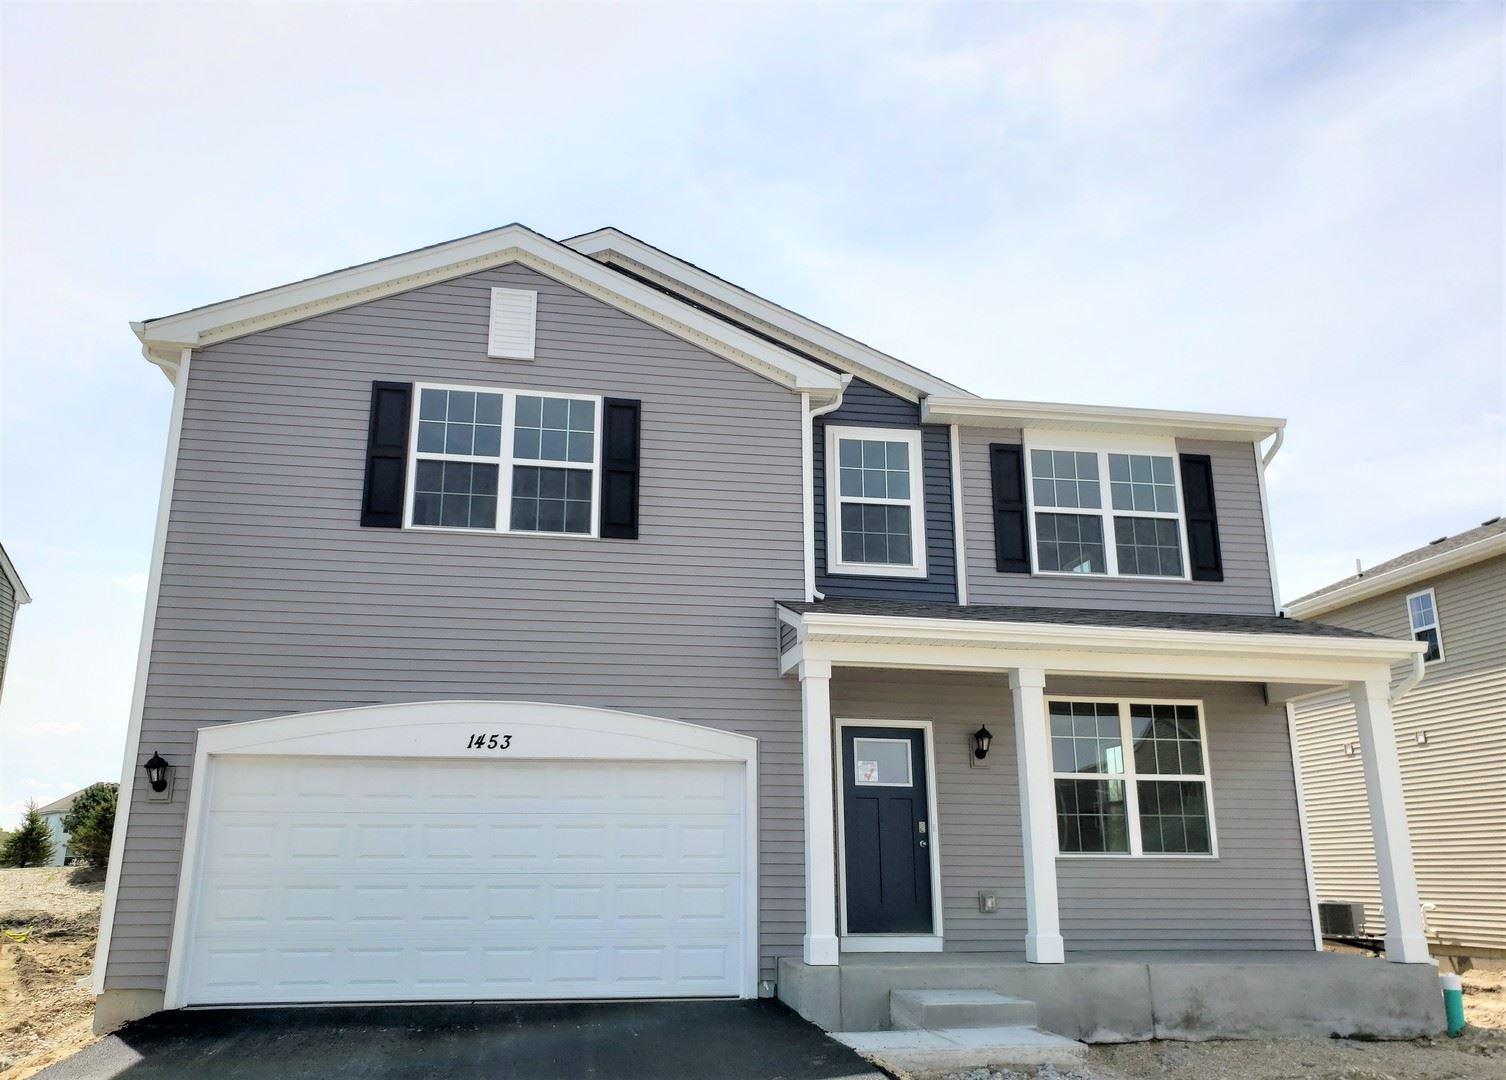 1453 Homewood Road, Pingree Grove, IL 60140 - #: 10651553